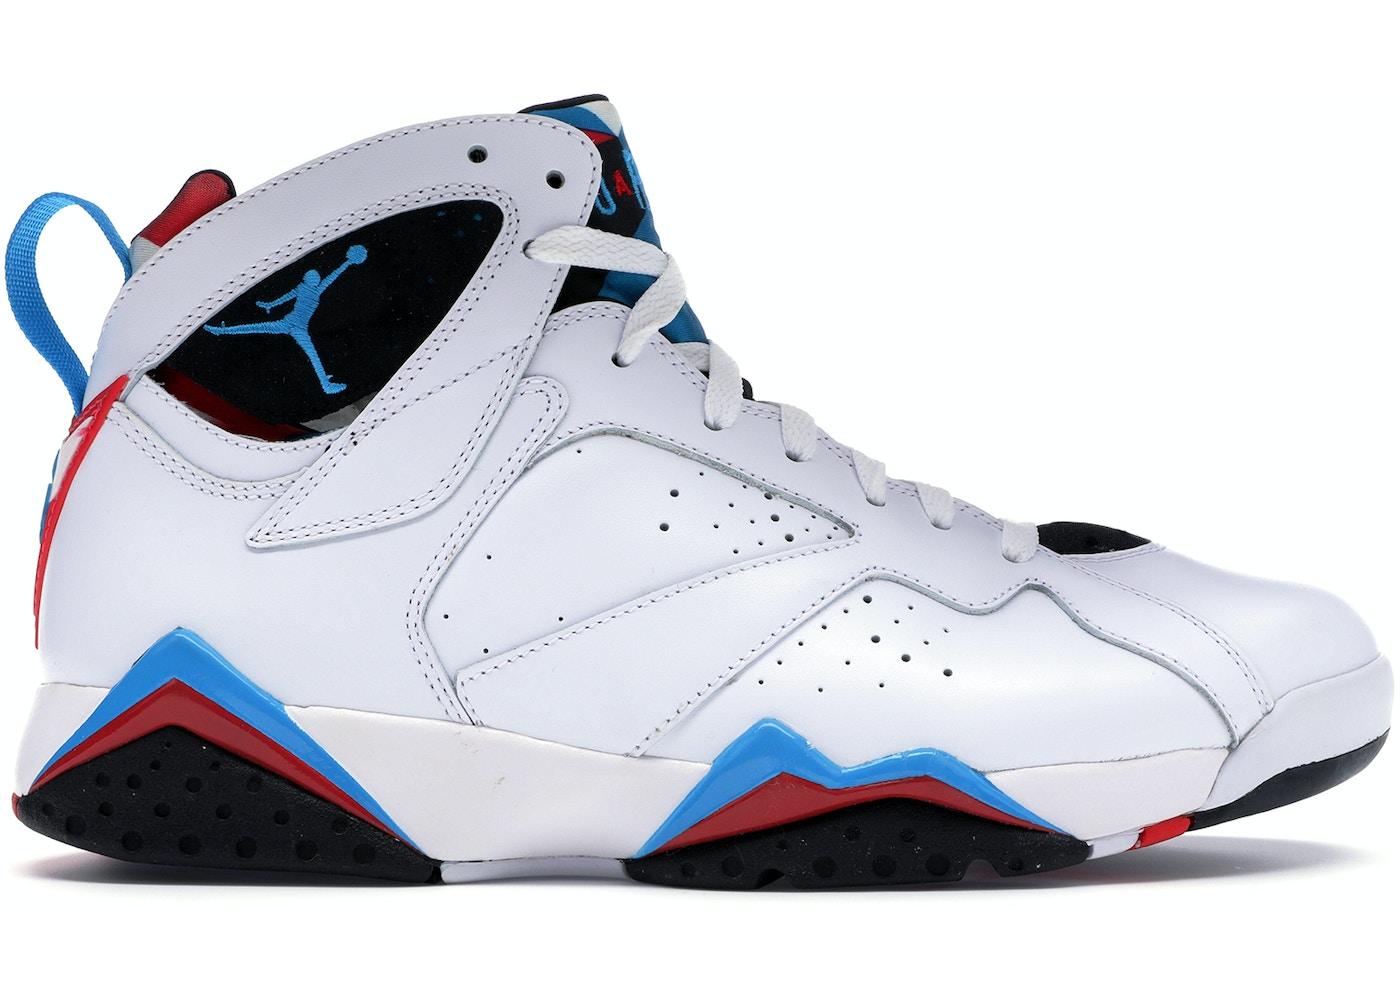 hot sale online 9413f f2f20 air jordan 7 orion blue price